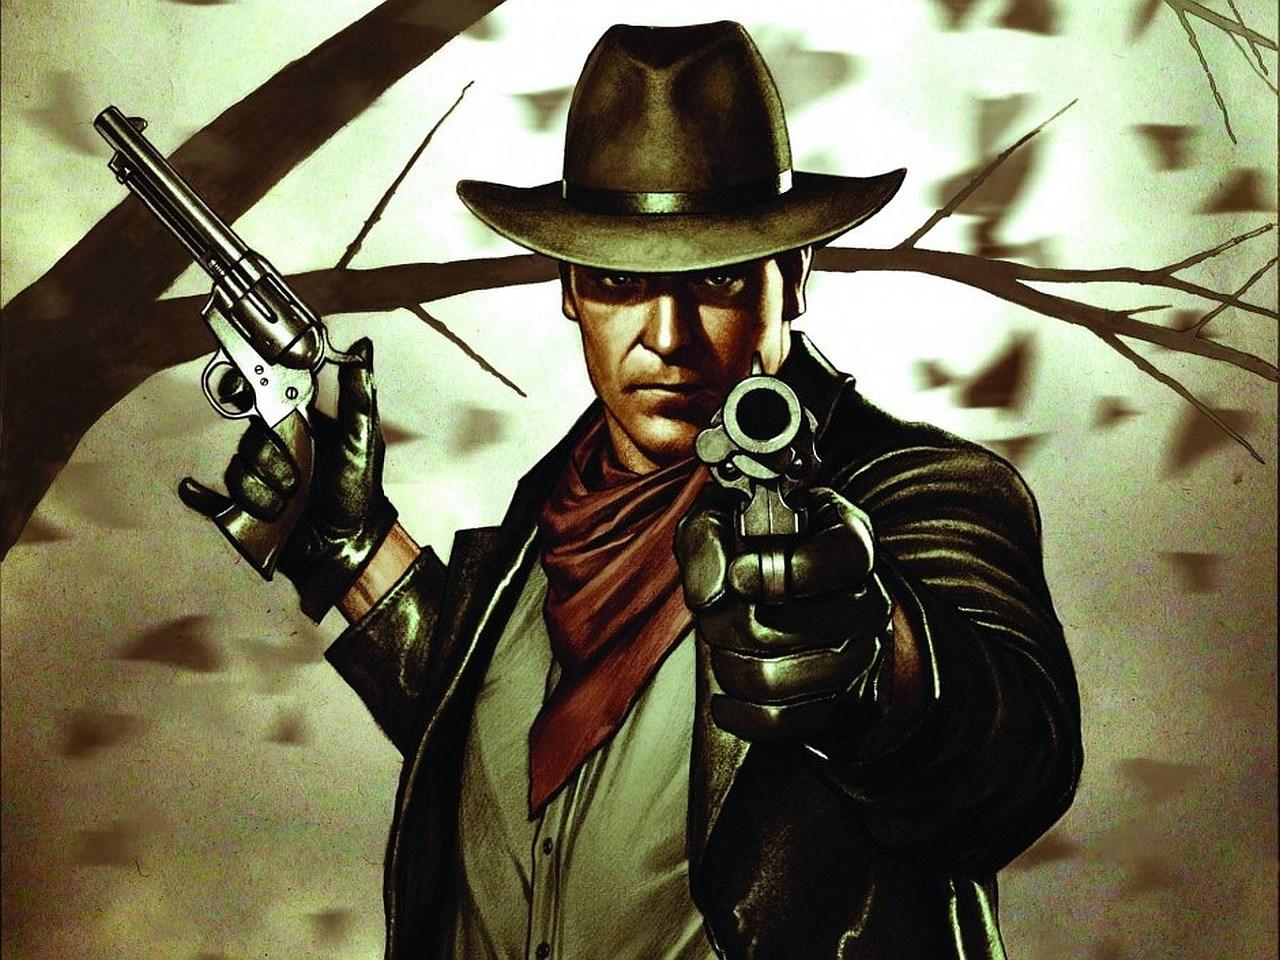 The Dark Tower Gunslinger Stephen King Art 1422887 Hd Wallpaper Backgrounds Download